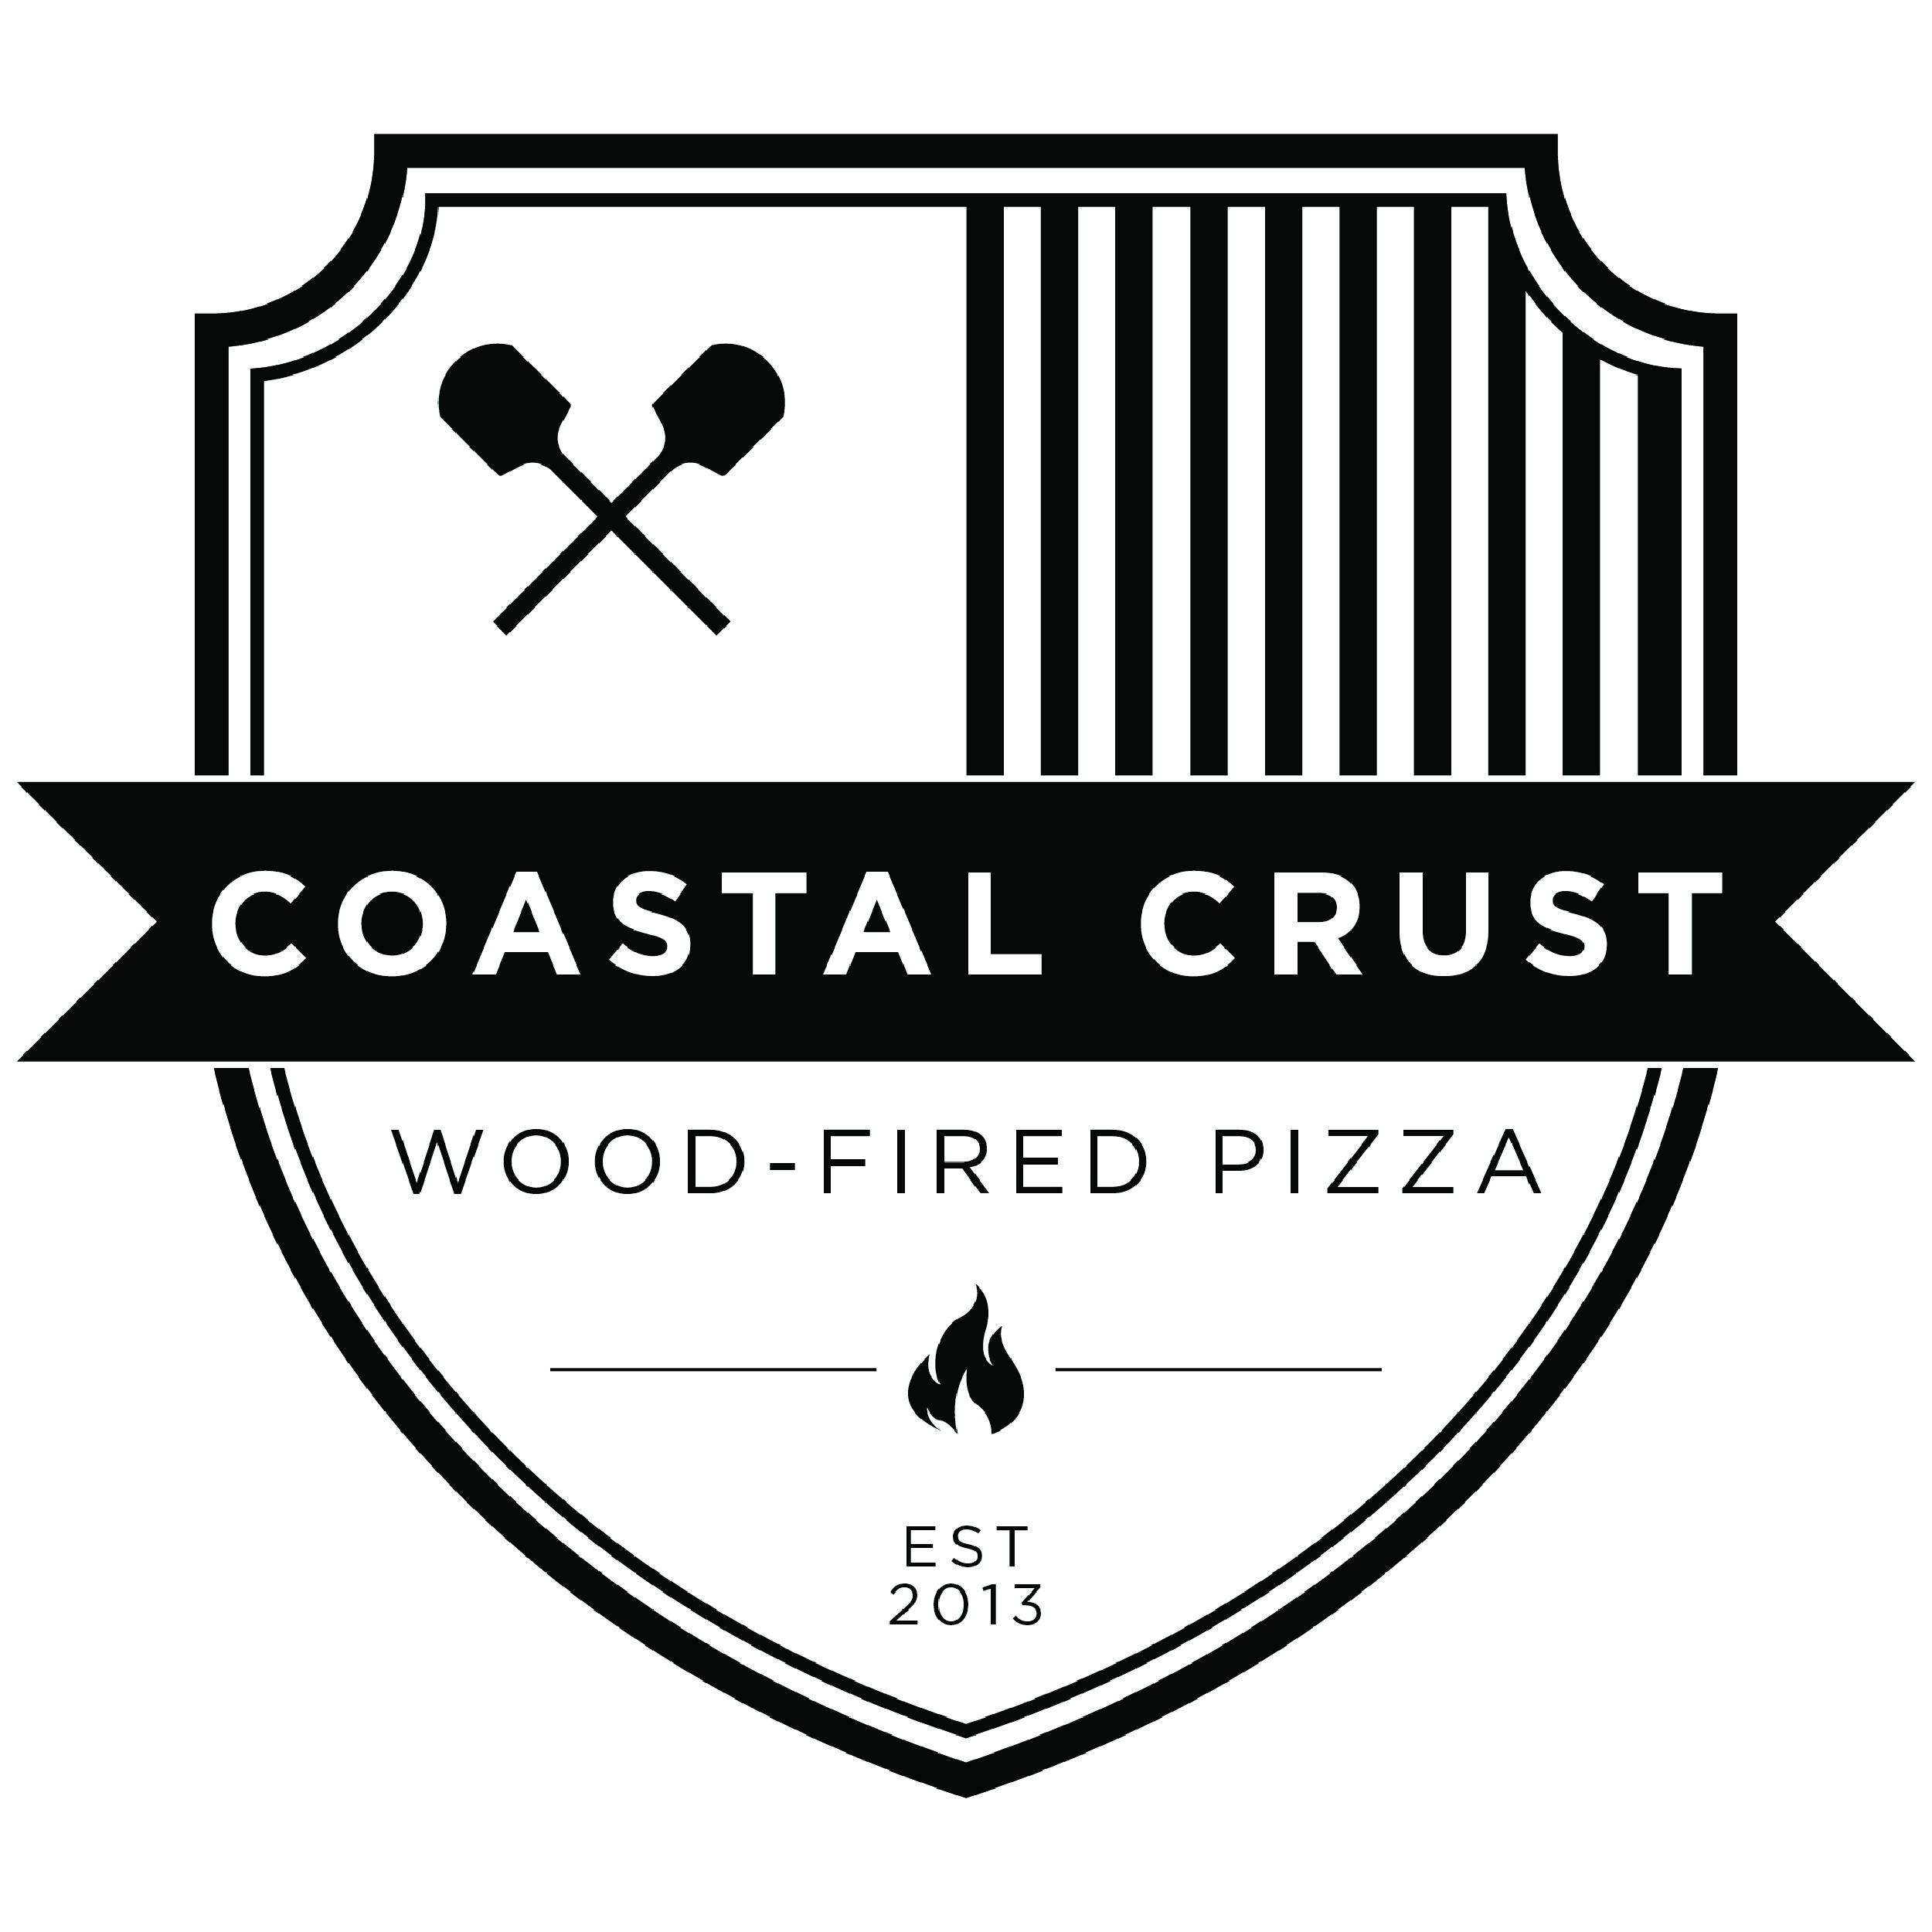 Coastal Crust Greenville